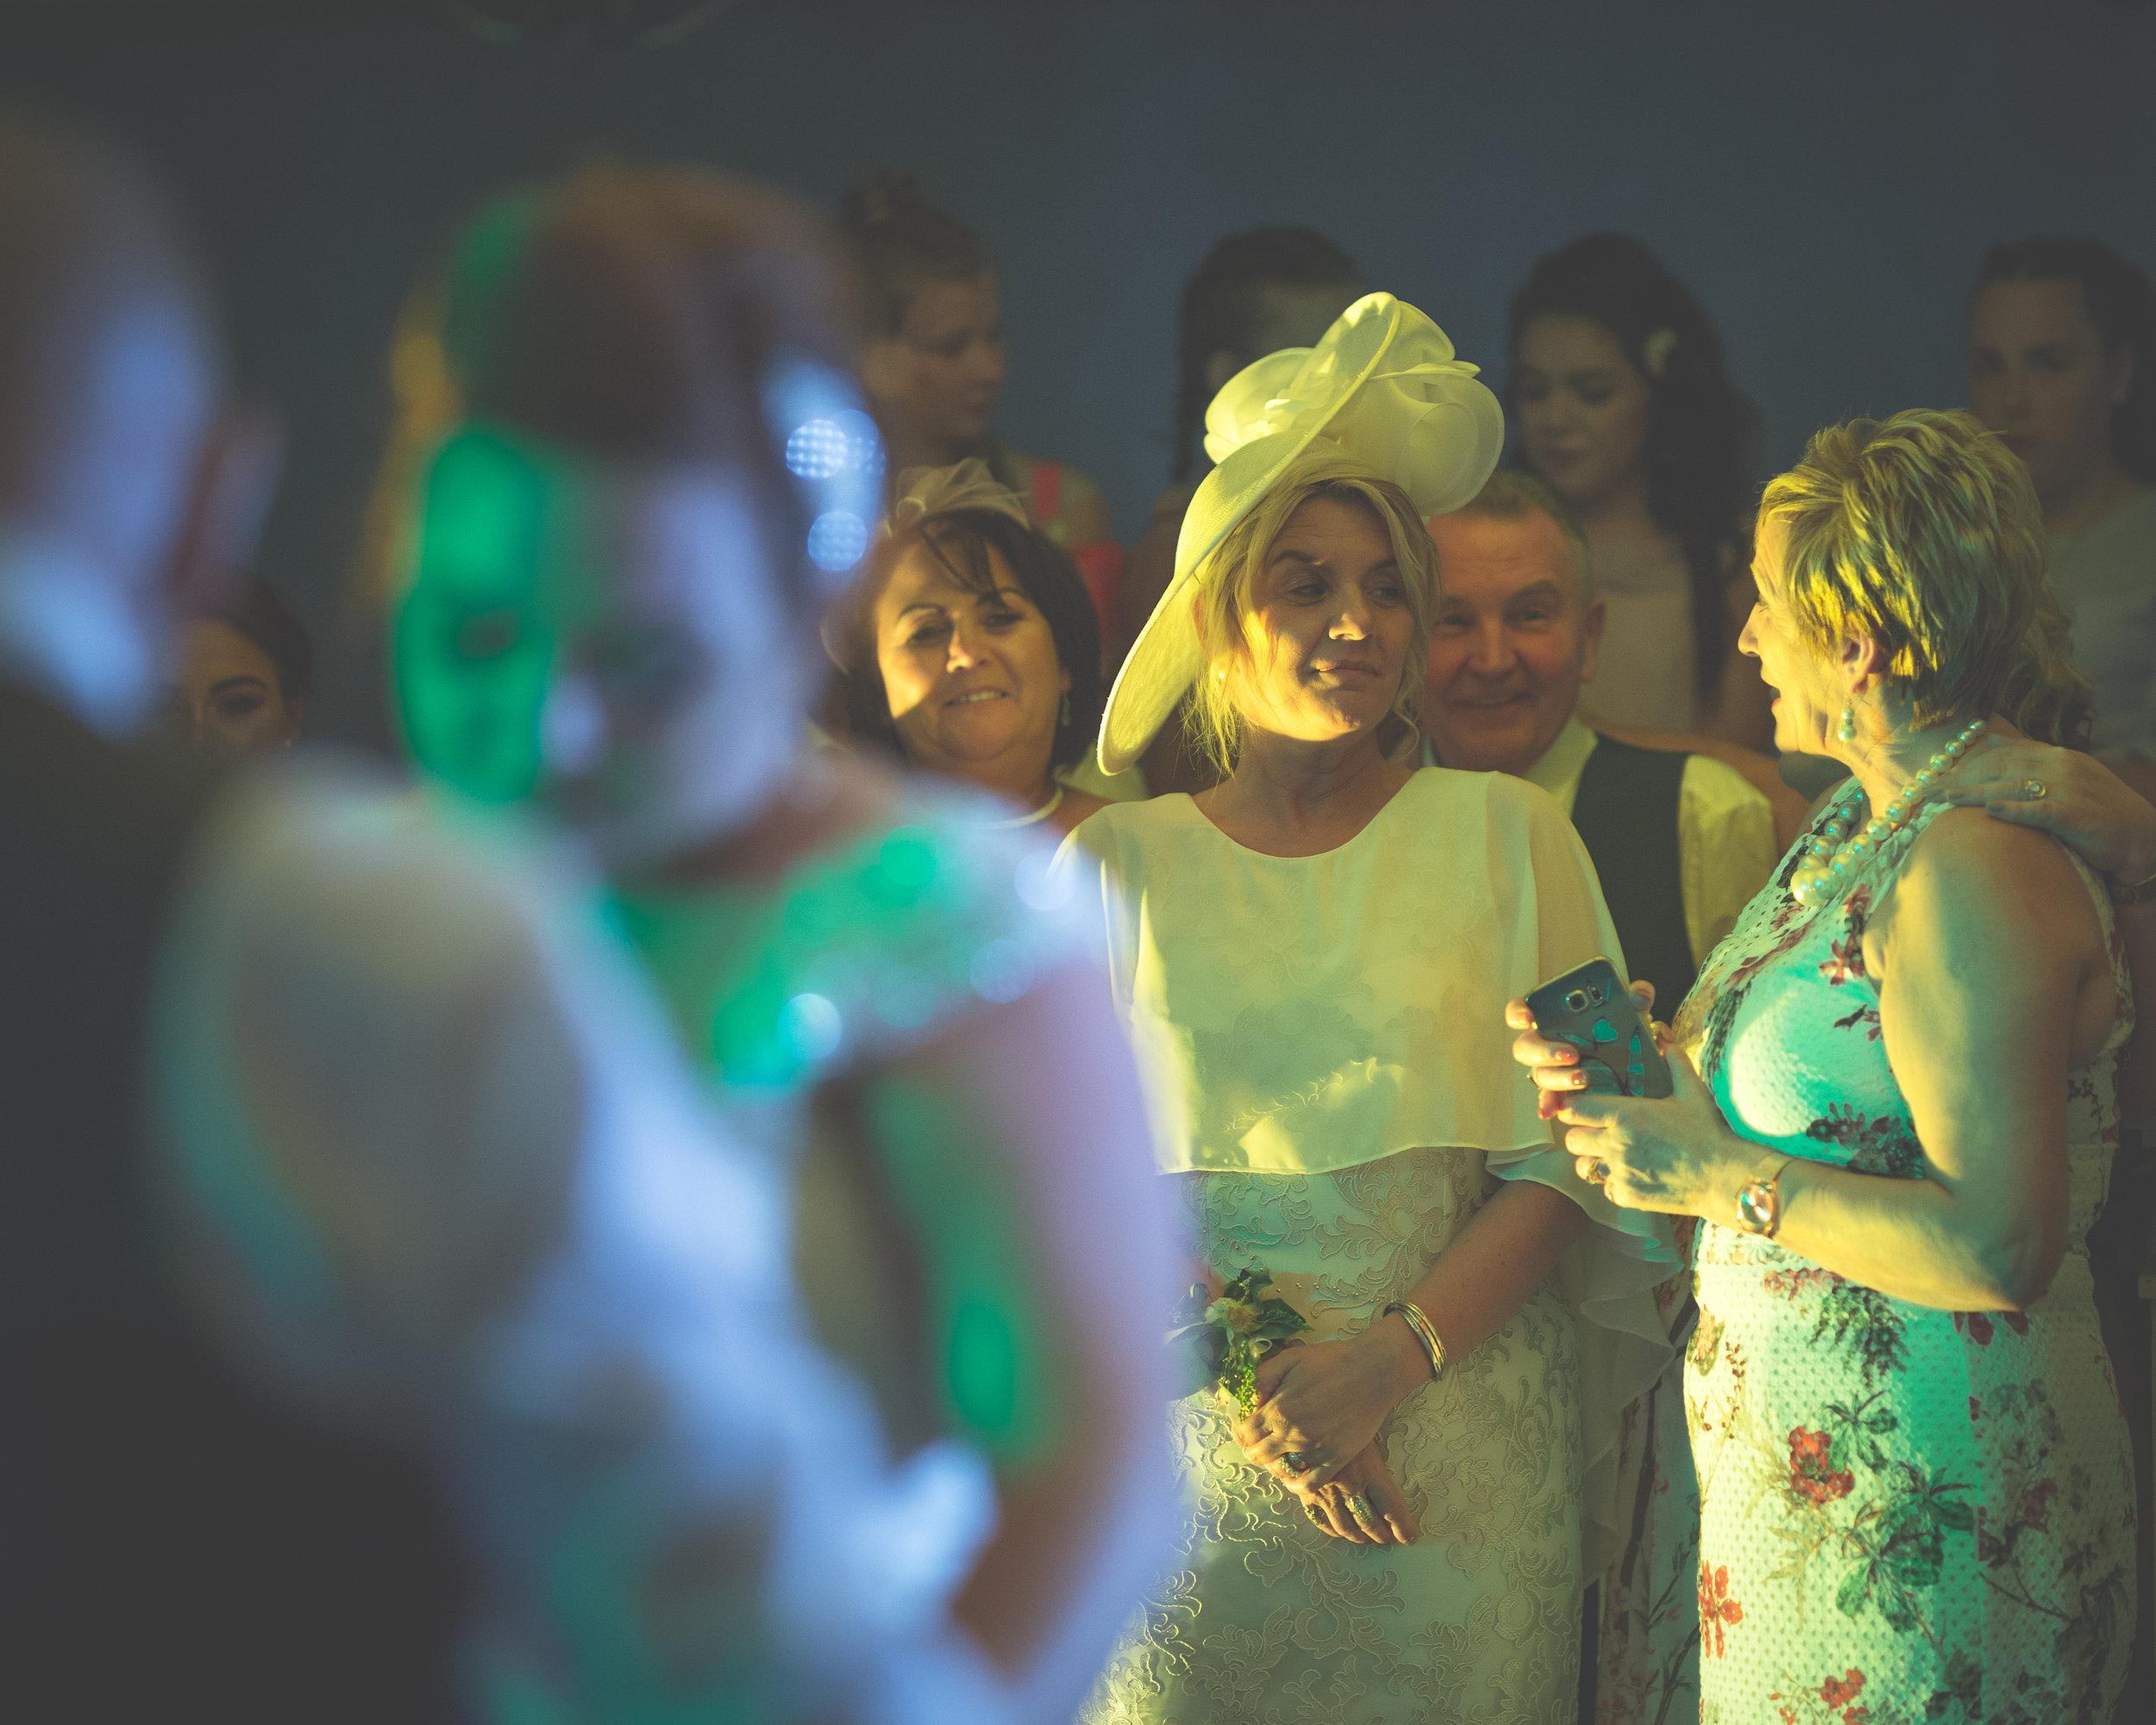 Antoinette & Stephen - First Dance | Brian McEwan Photography | Wedding Photographer Northern Ireland 48.jpg